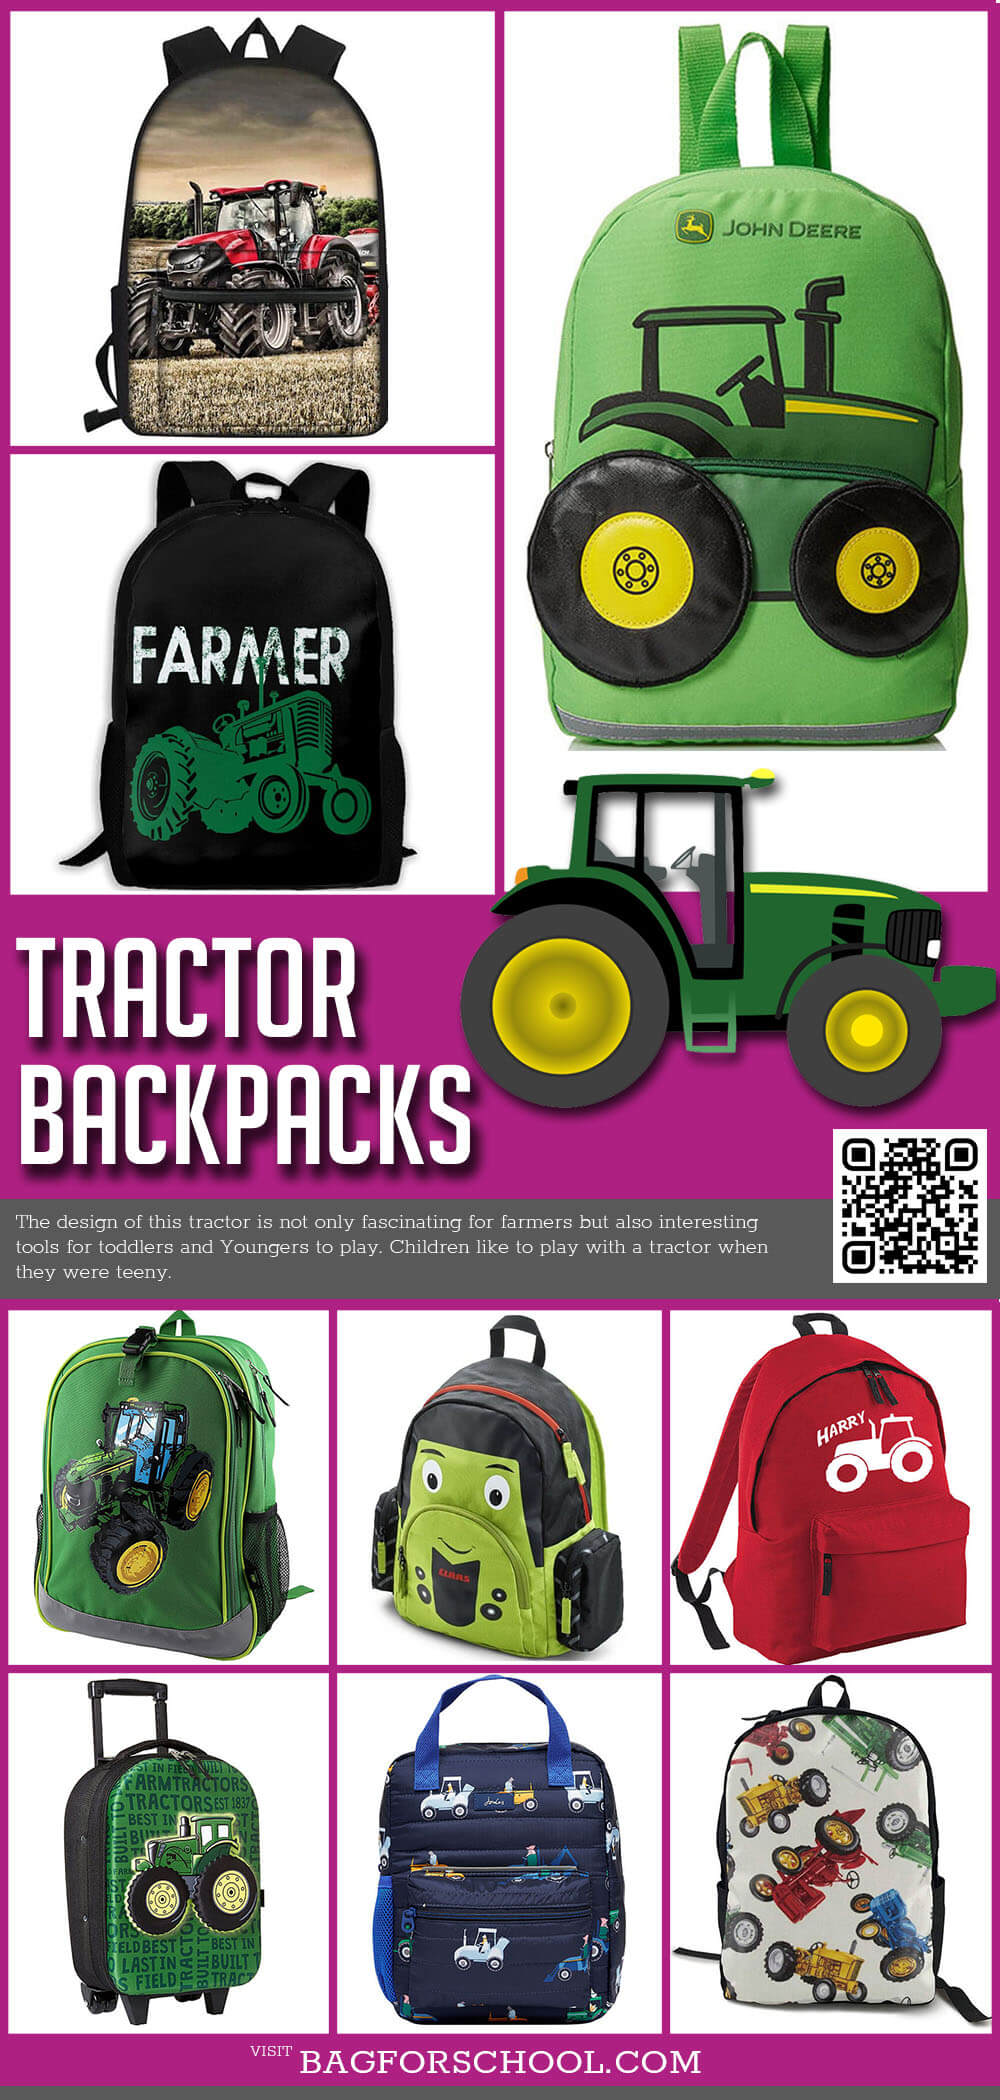 Tractor Backpacks